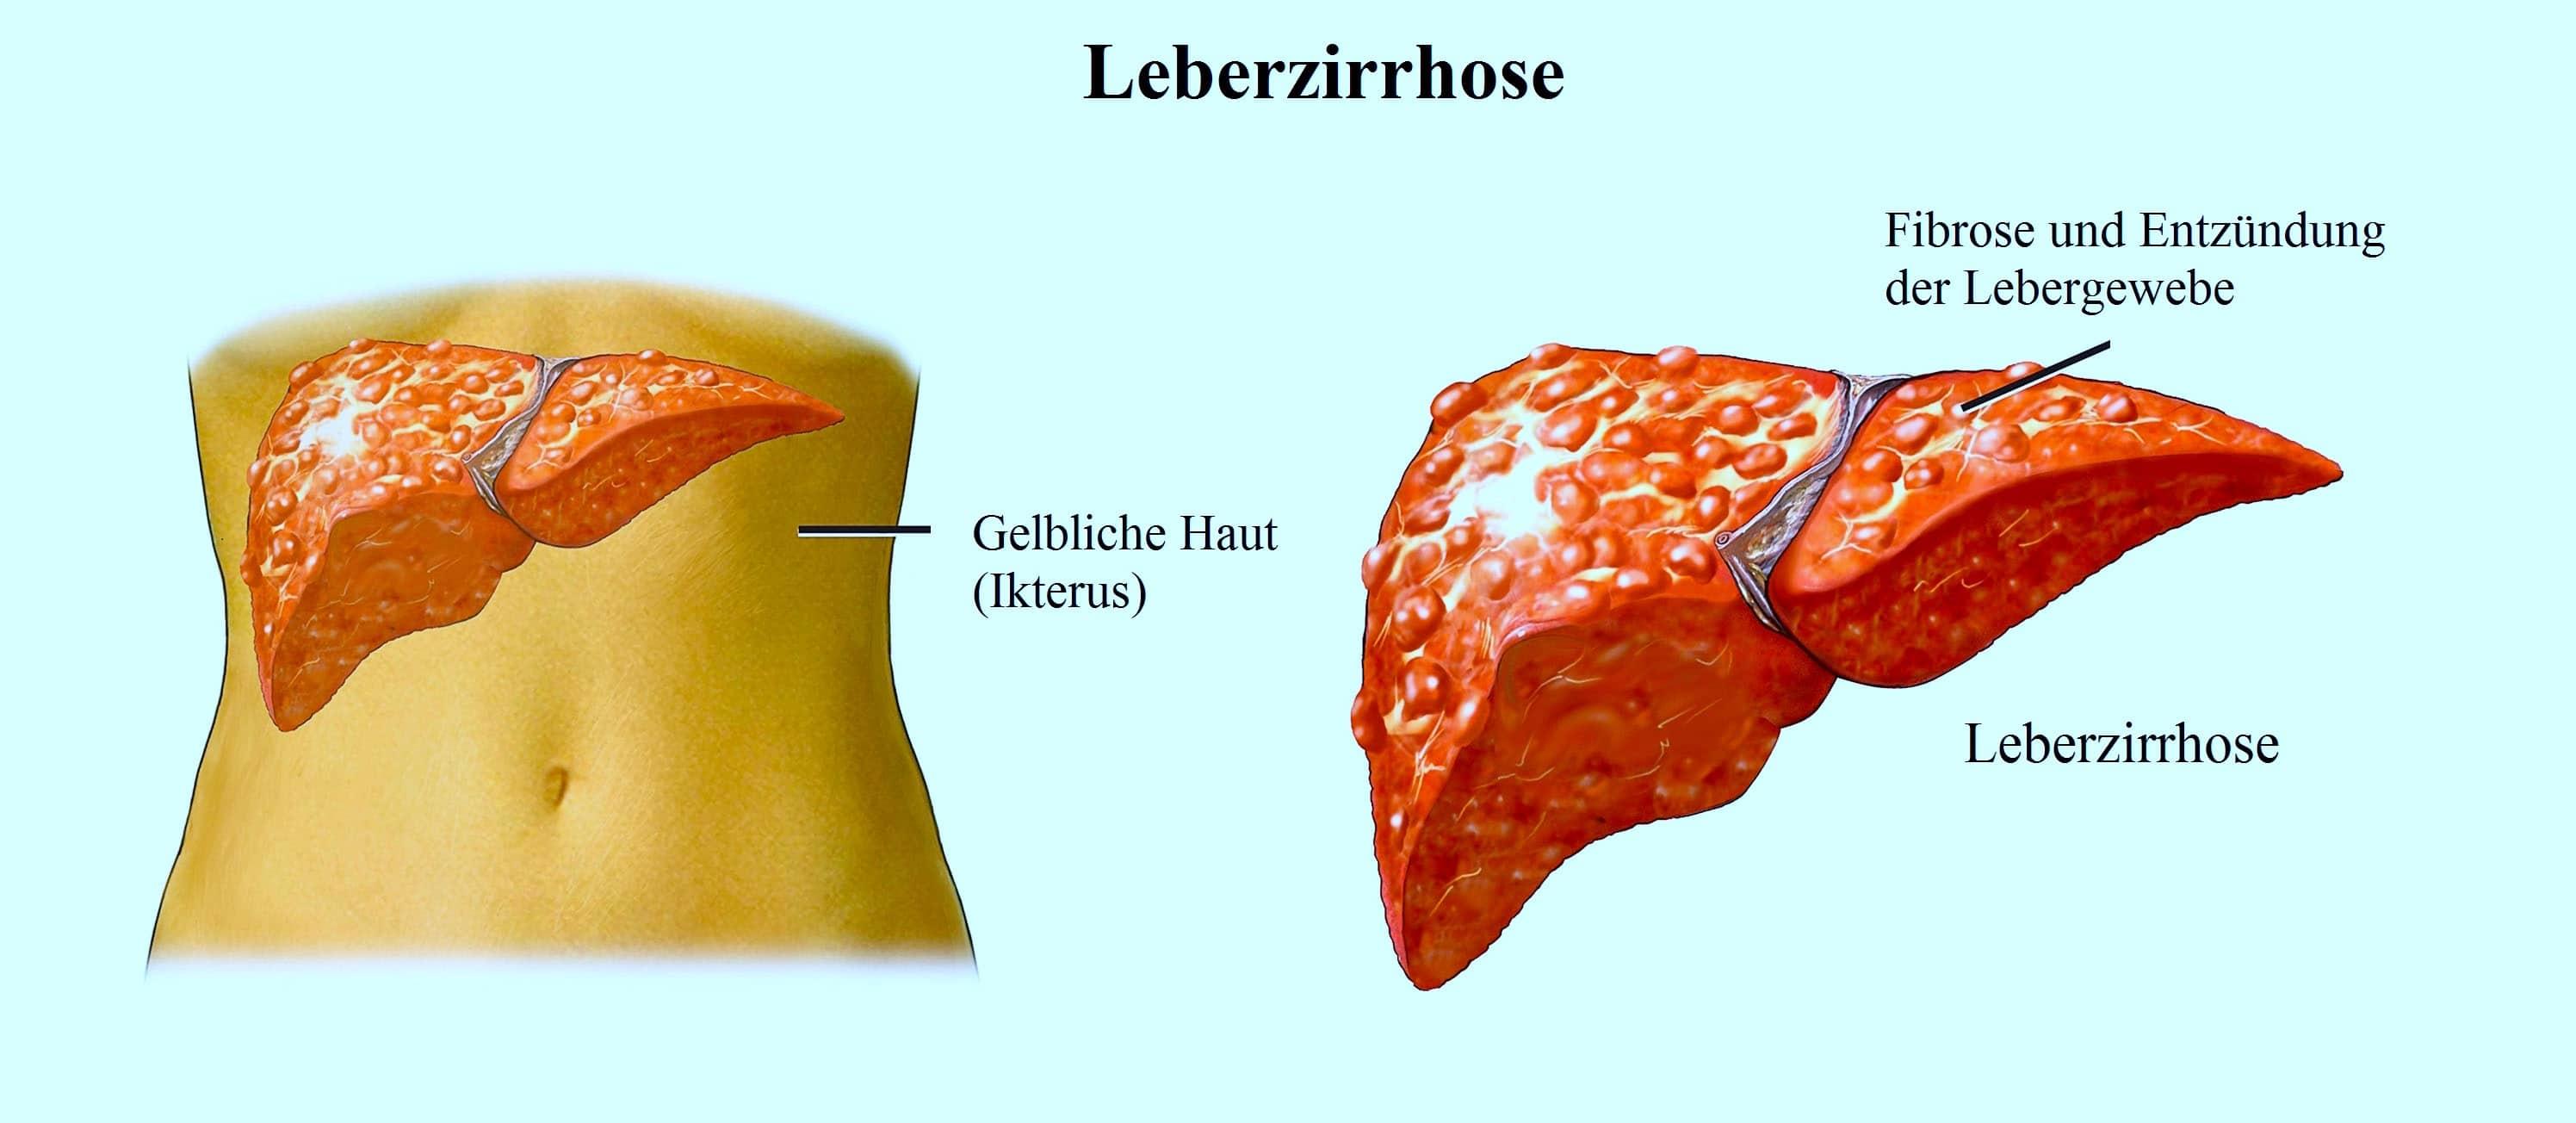 Leberzirrhose,Fibrose,Ikterus